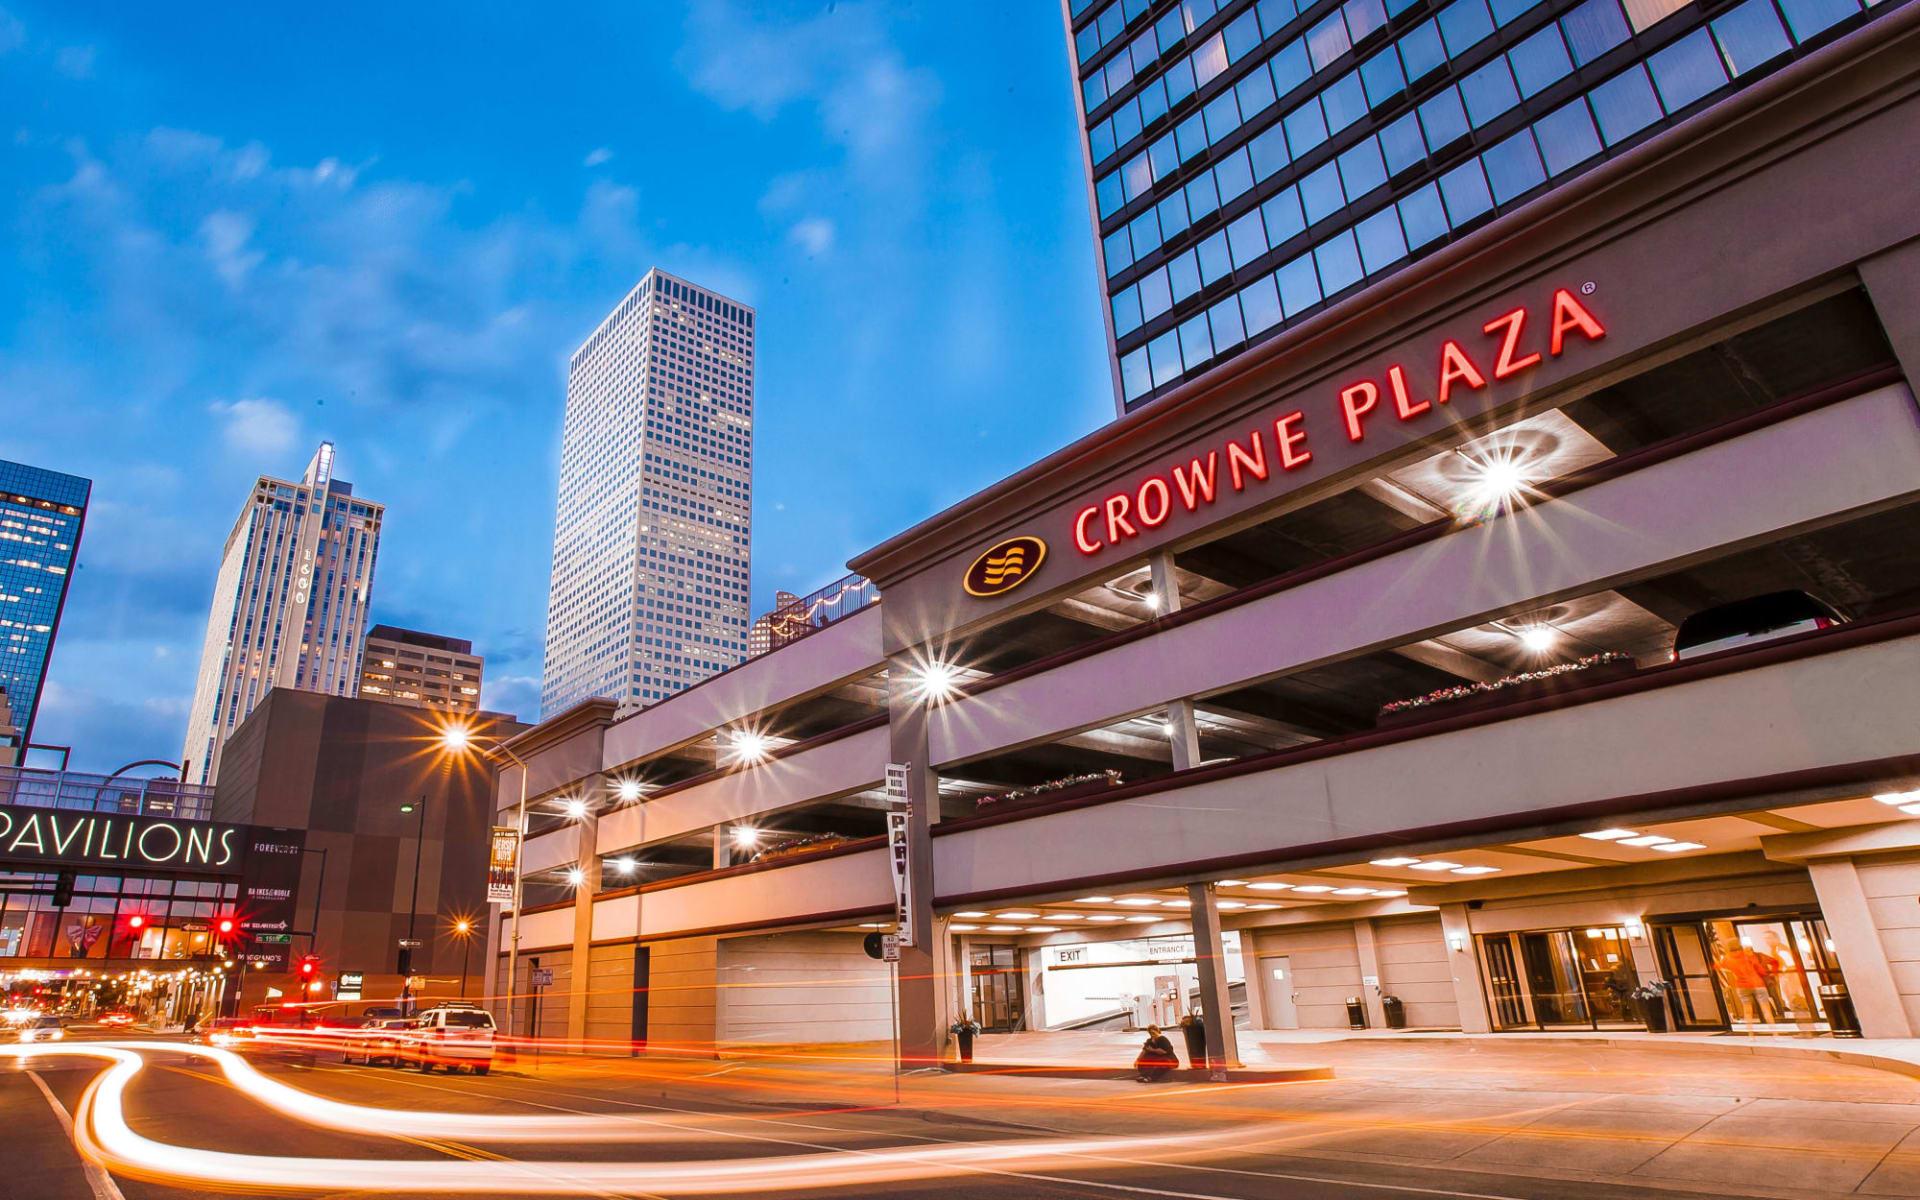 Crowne Plaza Denver Downtown:  Crowne Plaza Denver - long exposure evening